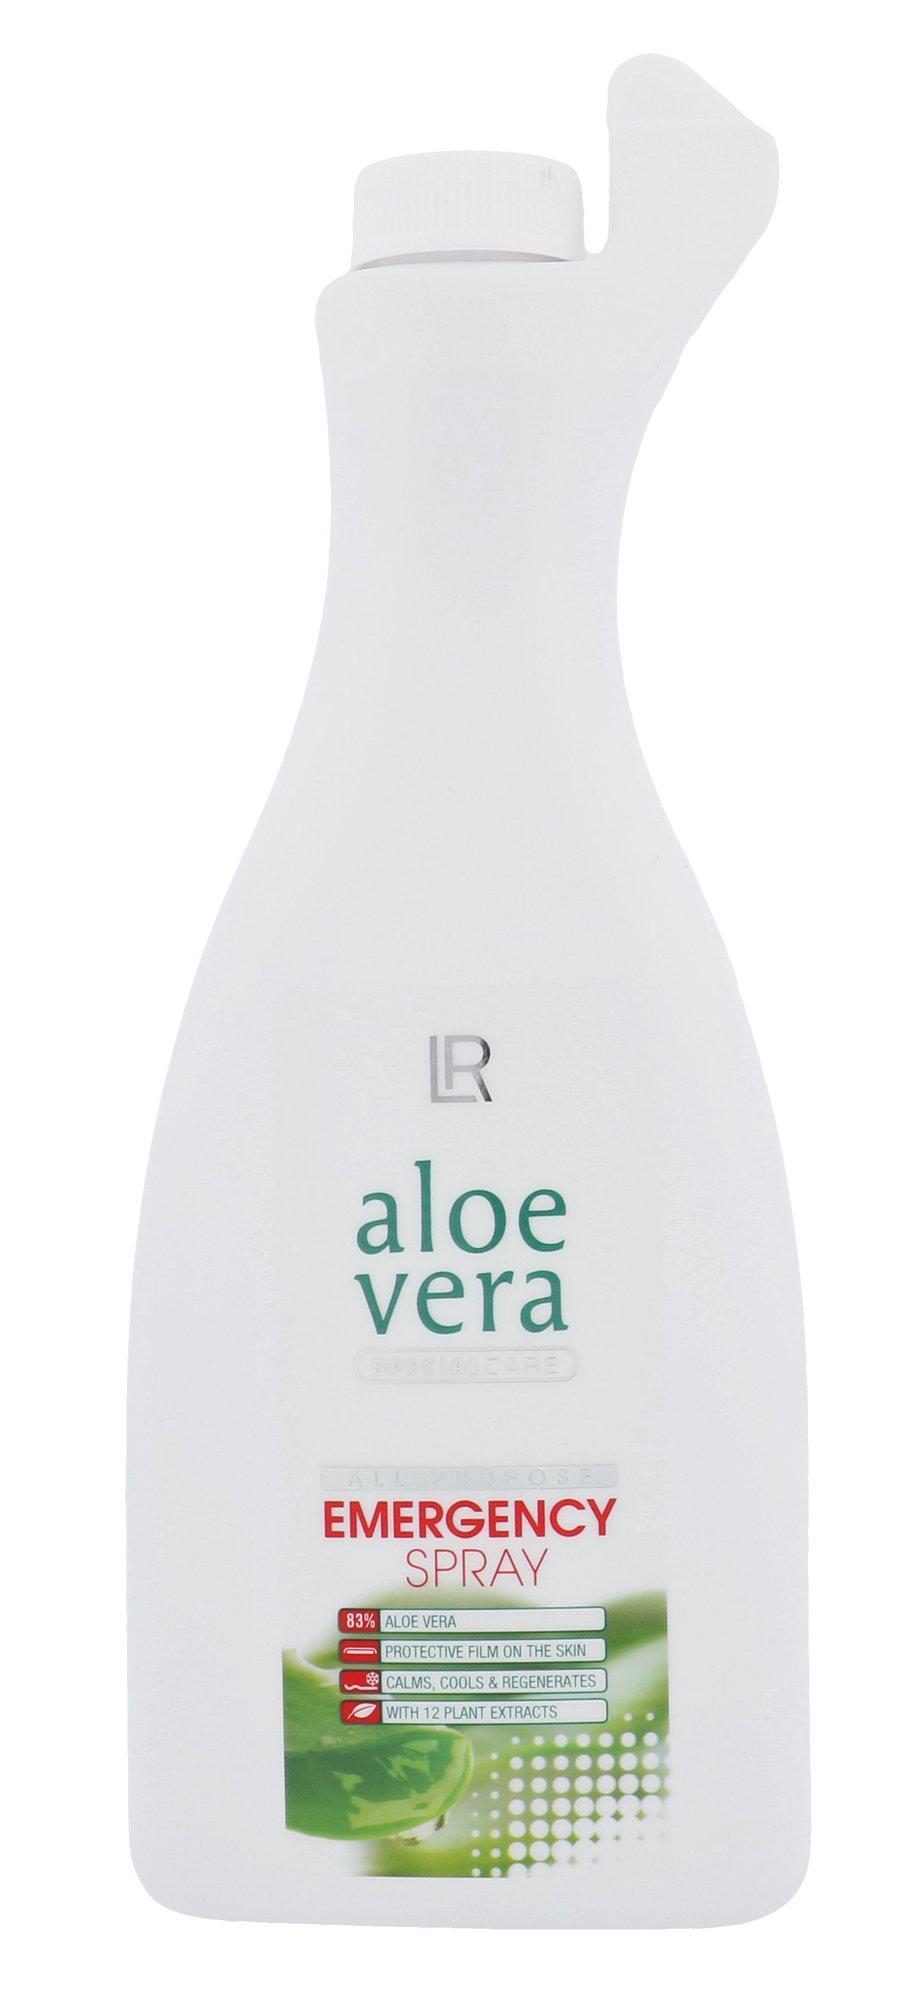 LR Aloe Vera Cosmetic 500ml  Emergency Spray